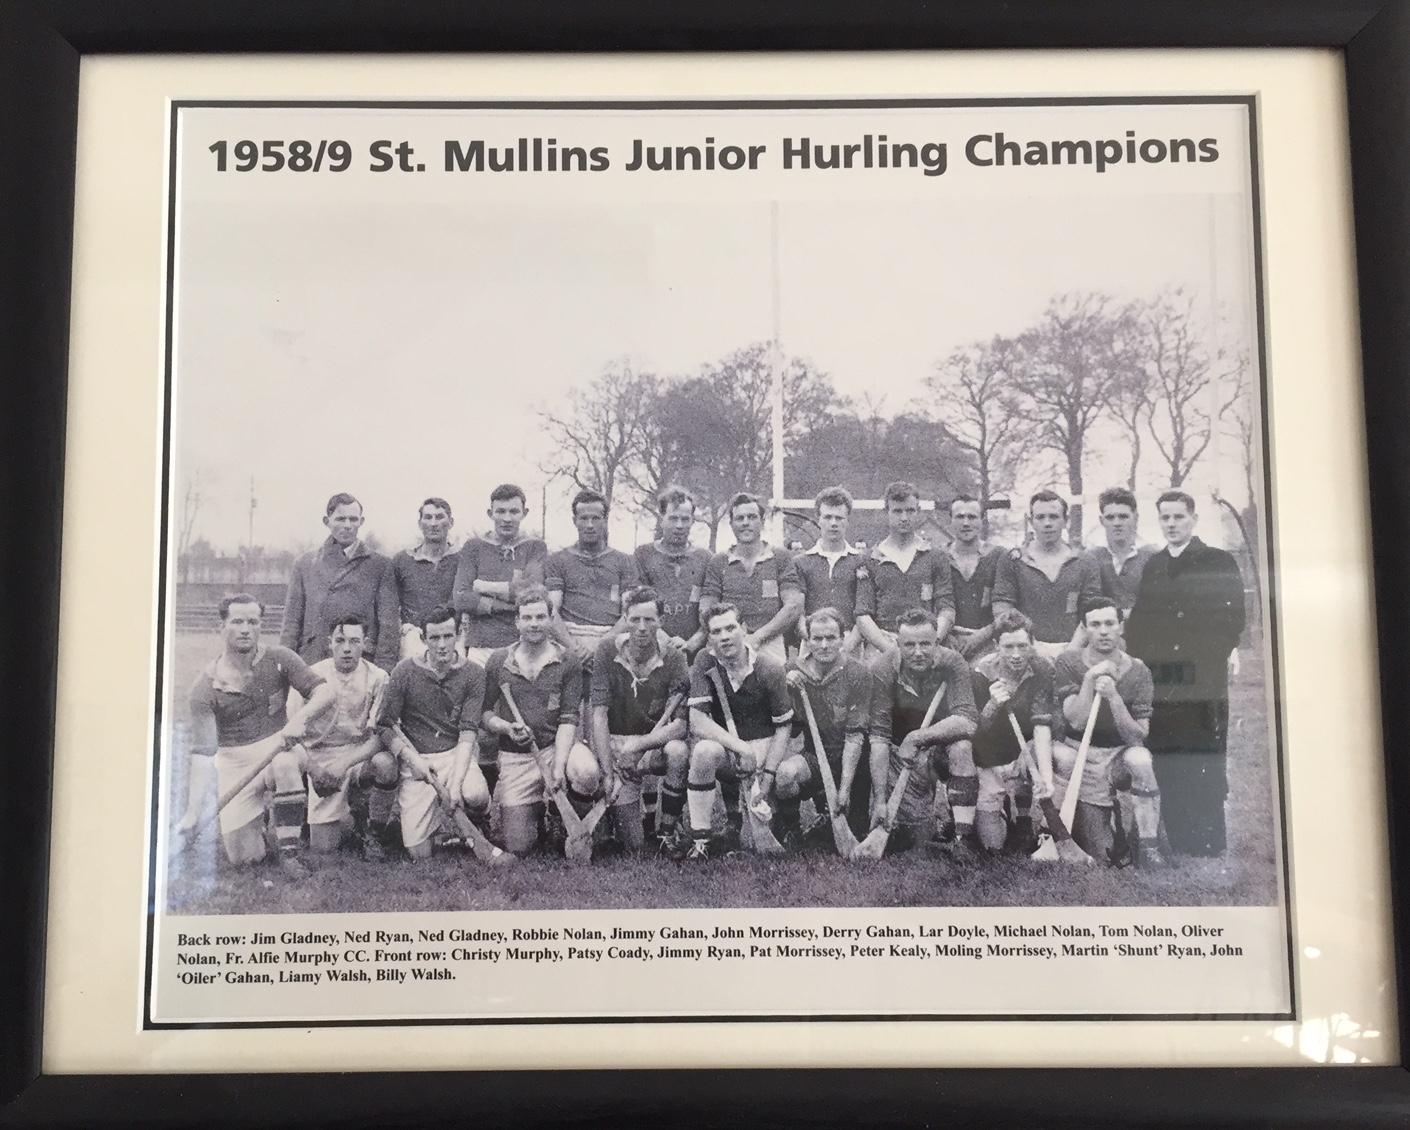 ARCHIVE SLOT; ST. MULLINS 1958 CHAMPIONS